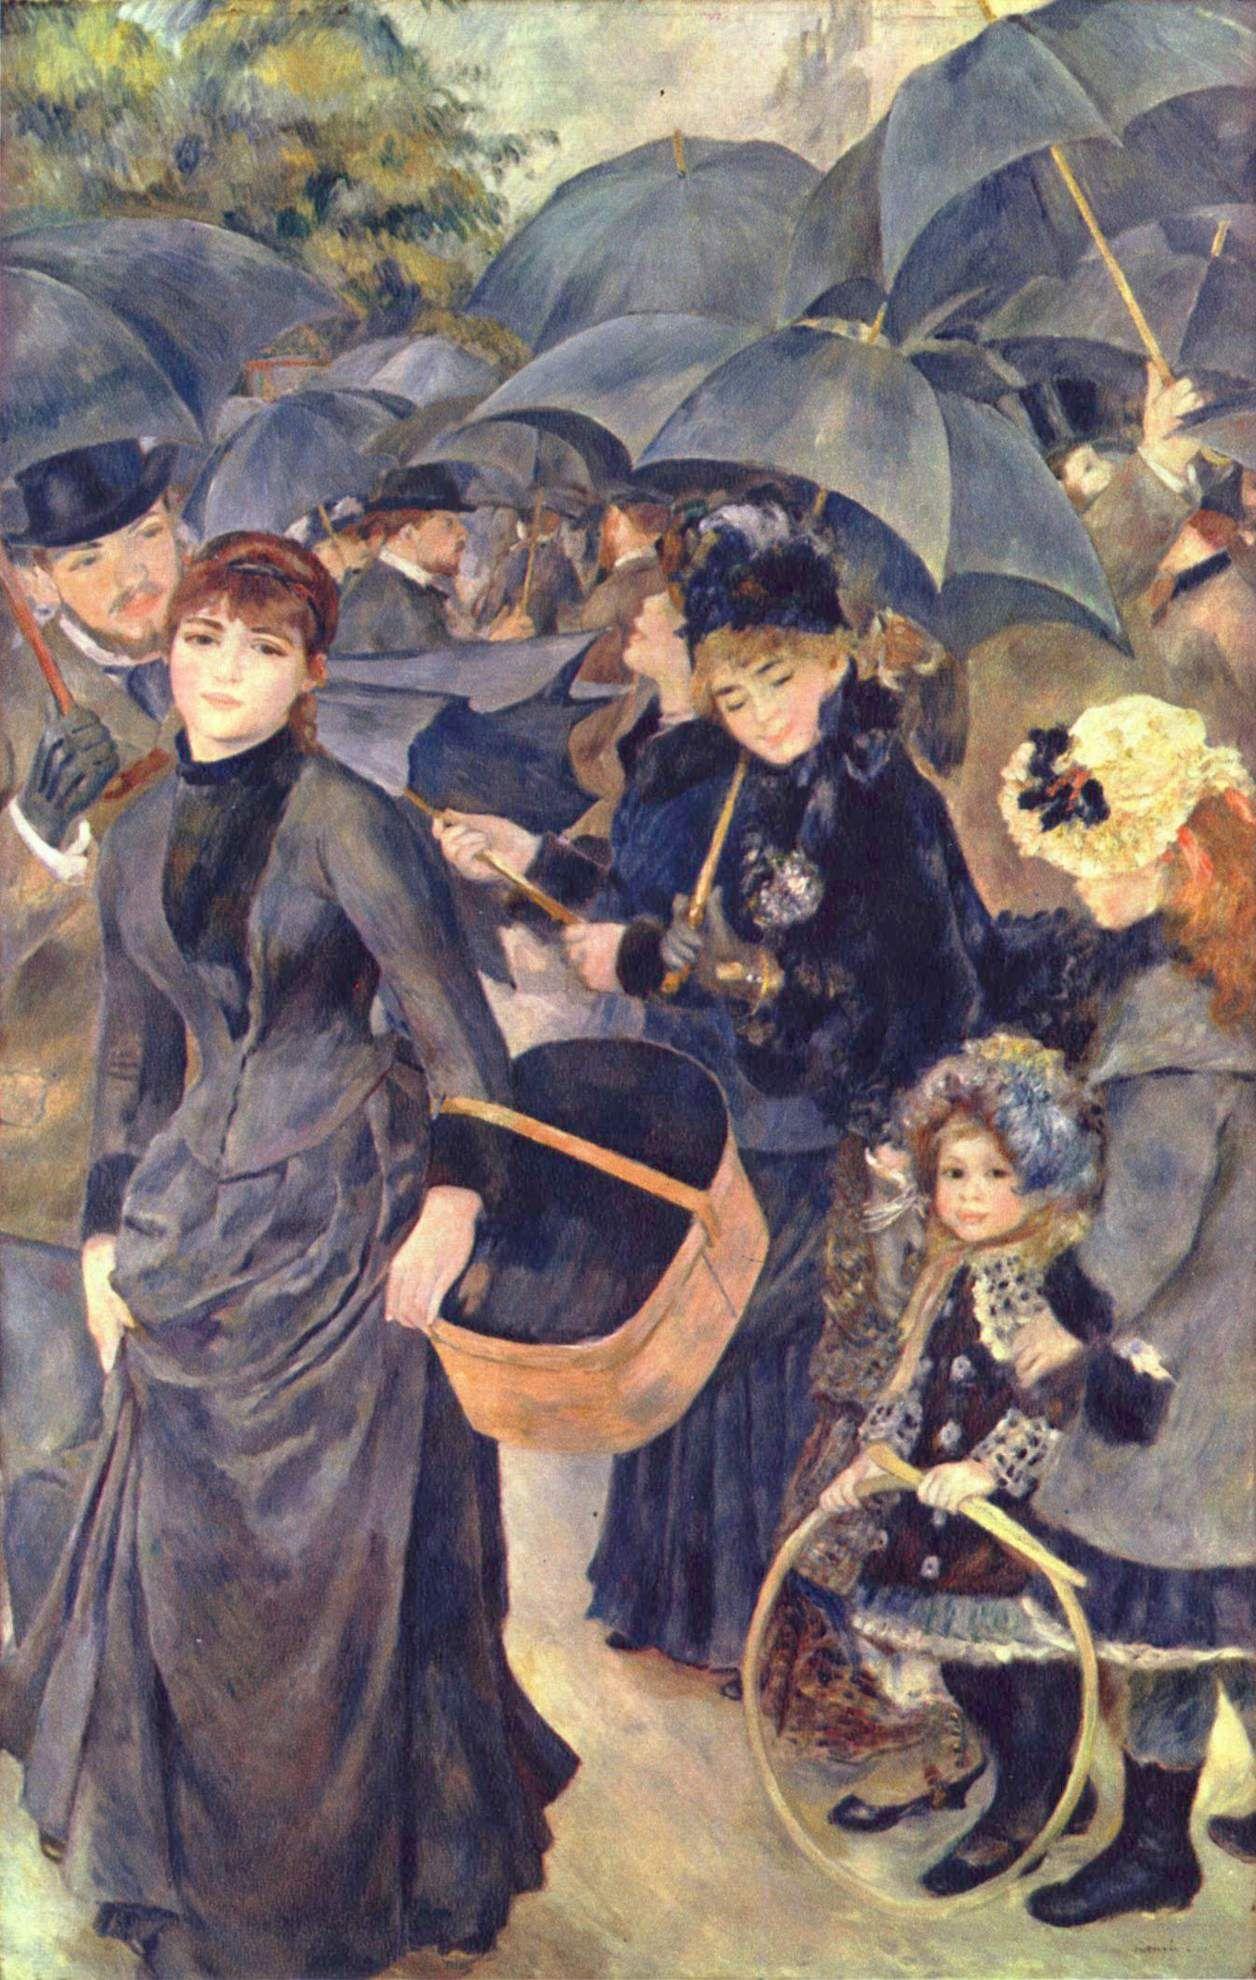 Pierre-Auguste Renoir (1841–1919) 1883 oil on canvas 180 × 115 cm  National Gallery Yorck Project: 10.000 Meisterwerke der Malerei. DVD-ROM, 2002. ISB